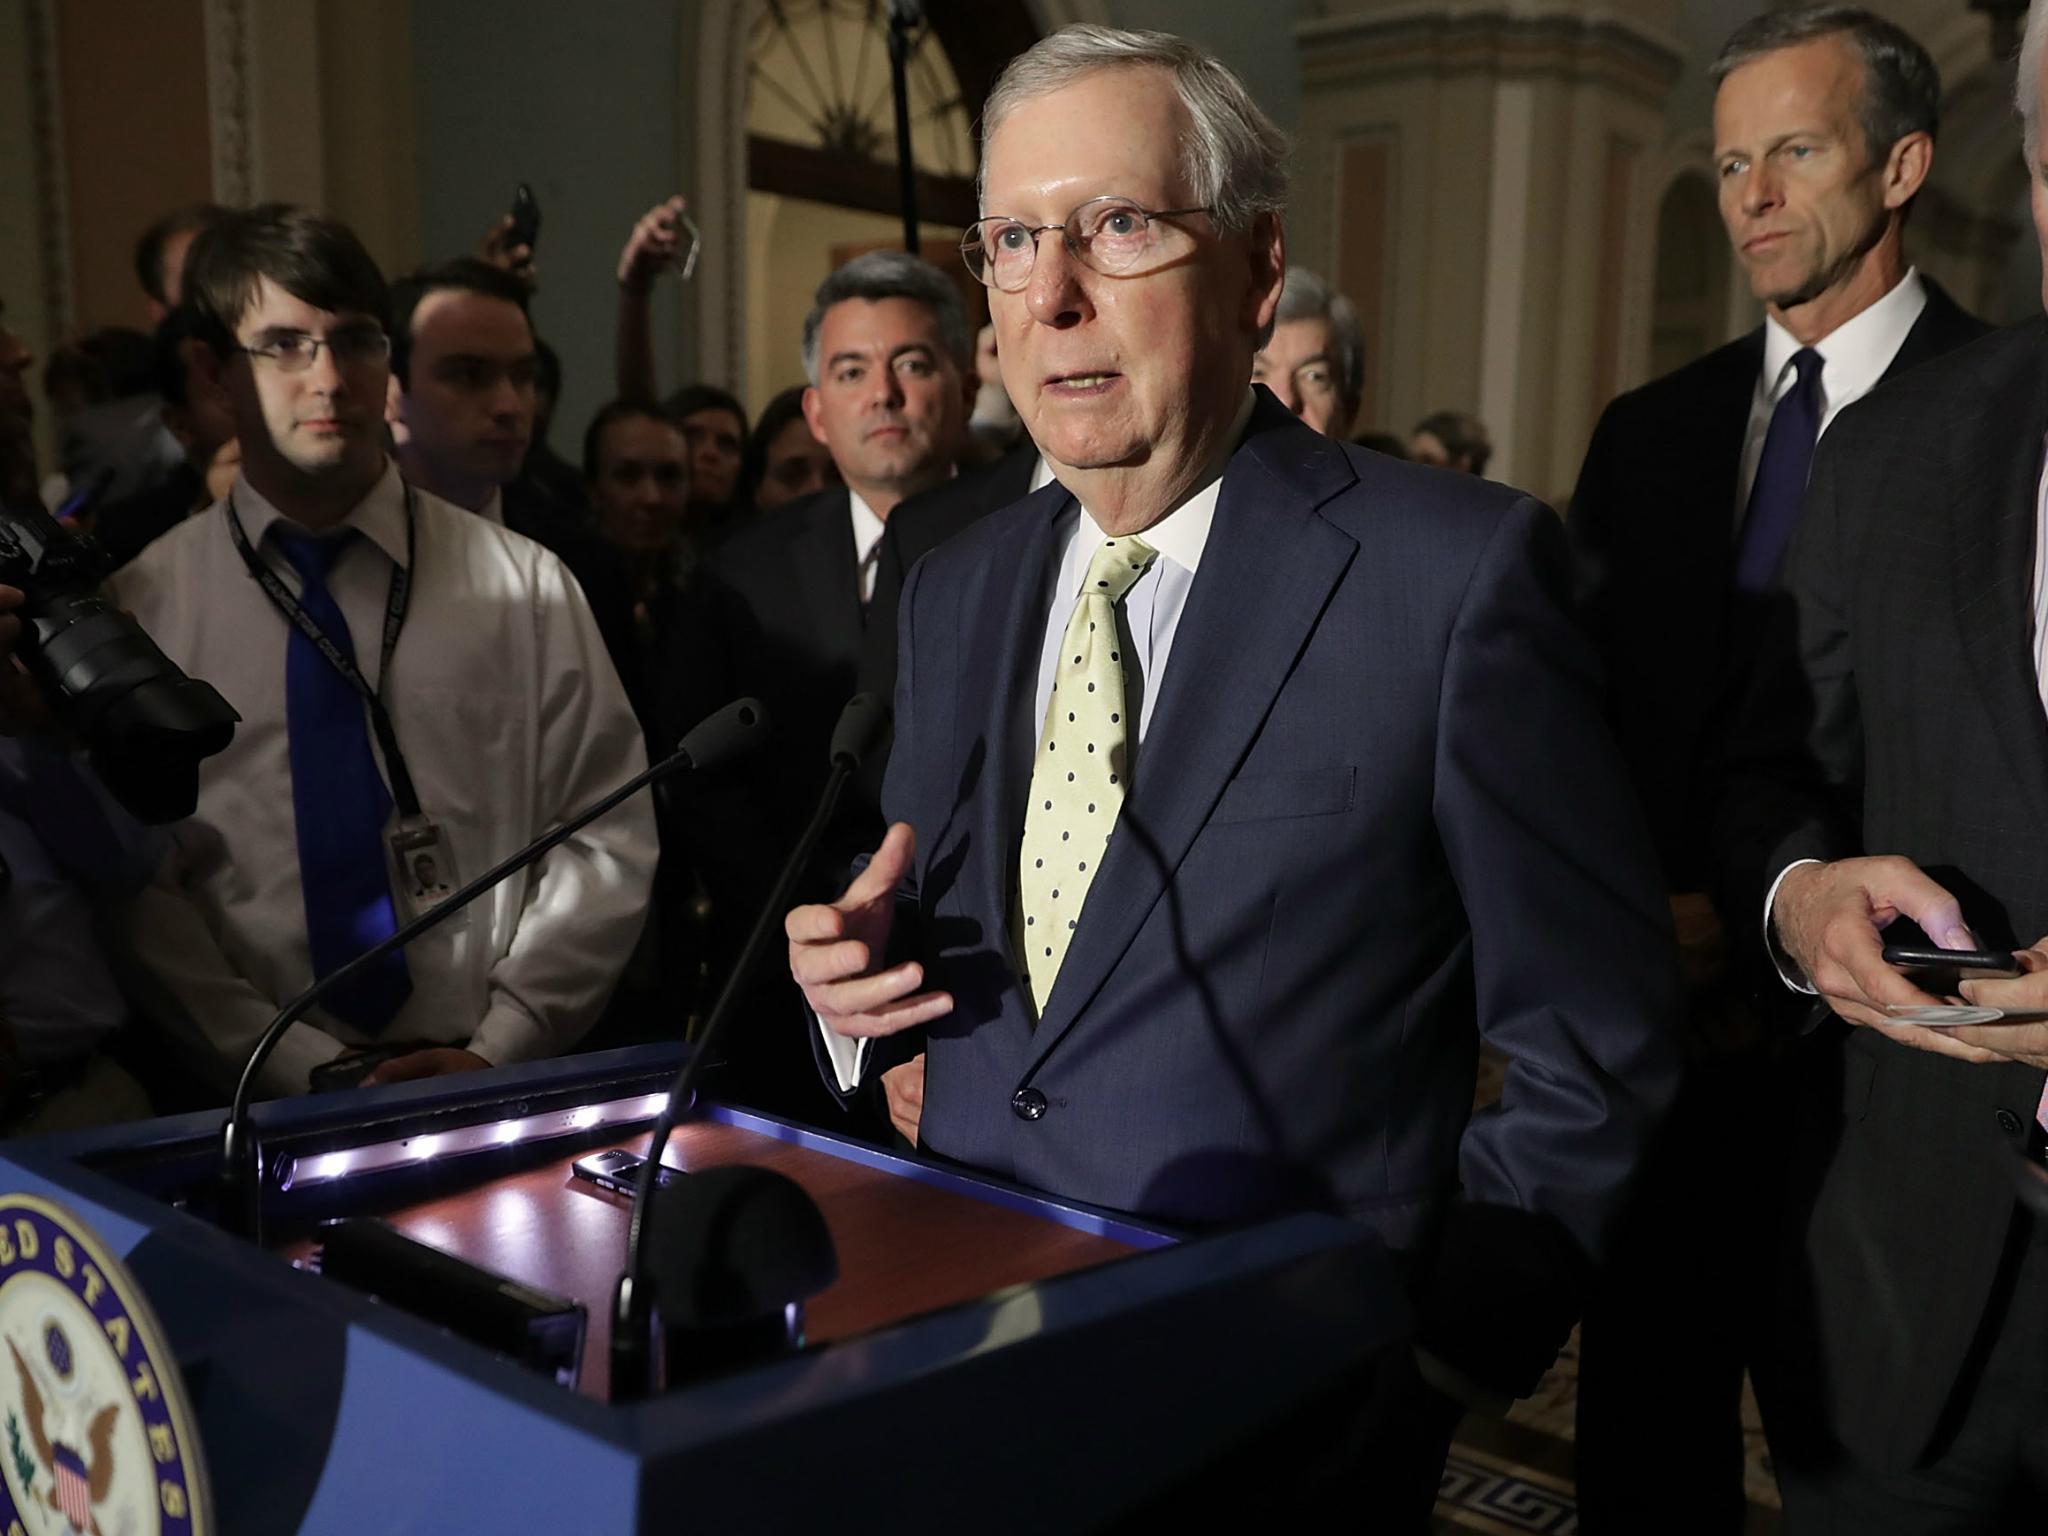 Trump healthcare plan faces possible defeat as enough Republican senators 'plan to oppose bill'